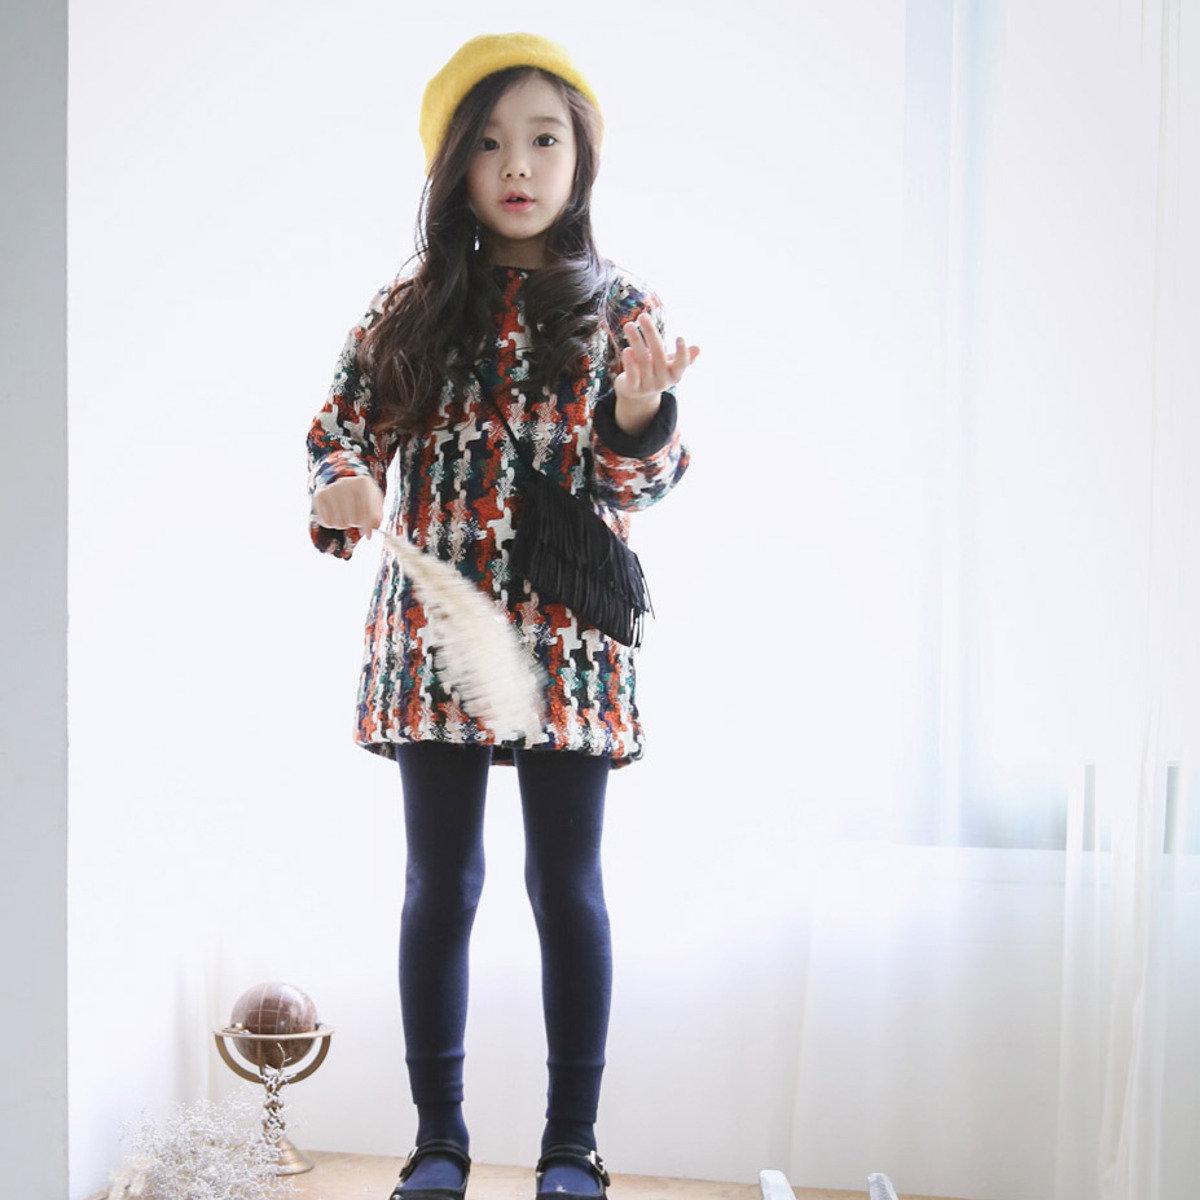 [15 W] 彩色花絨連身裙_S61509